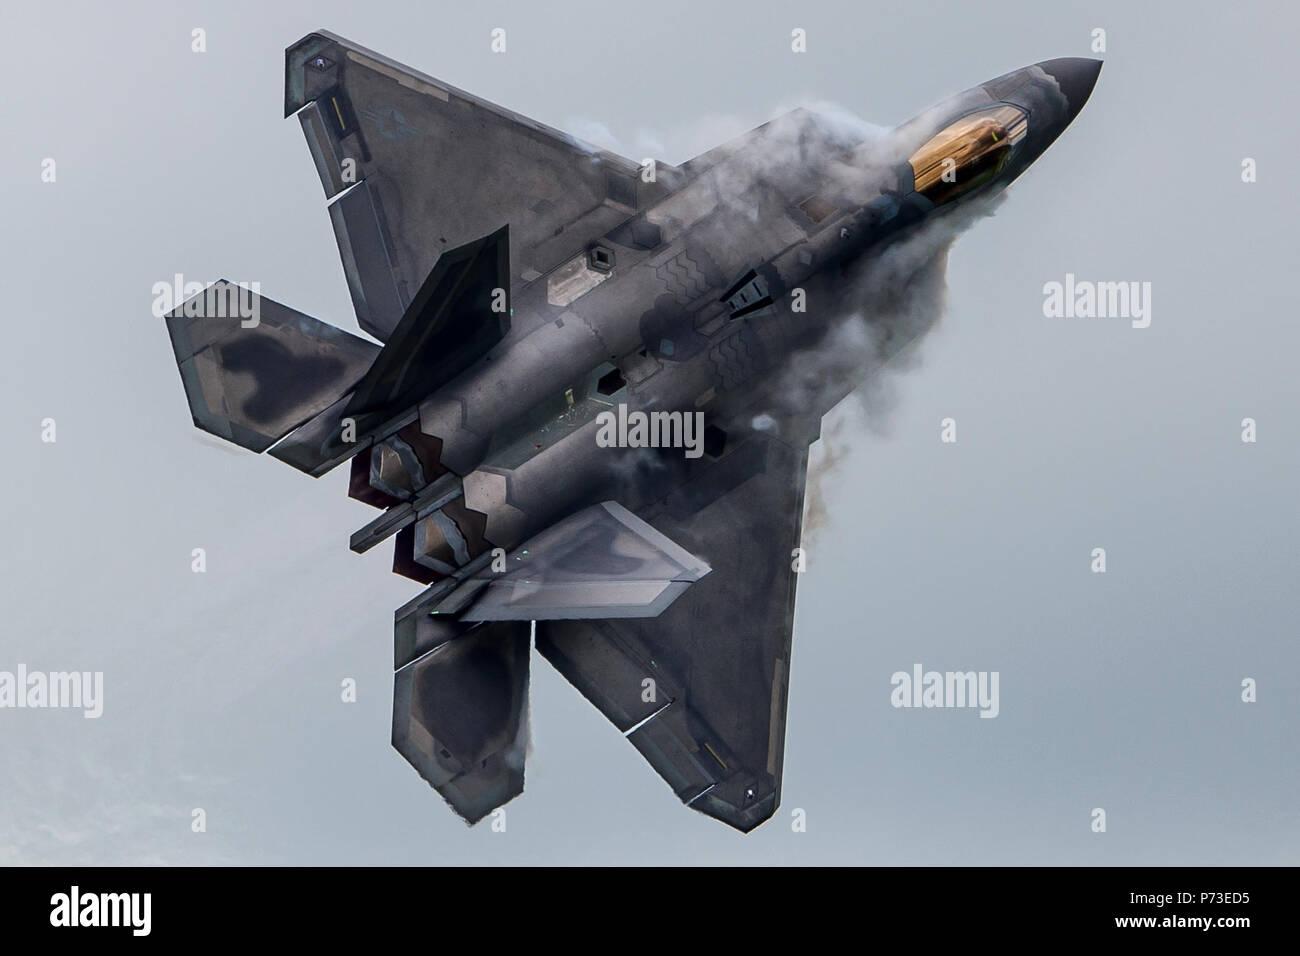 London, England, UK. 4th July, 2018. F-22 Fighter at Royal International Air Tattoo. Credit: SIPA Asia/ZUMA Wire/Alamy Live News Stock Photo